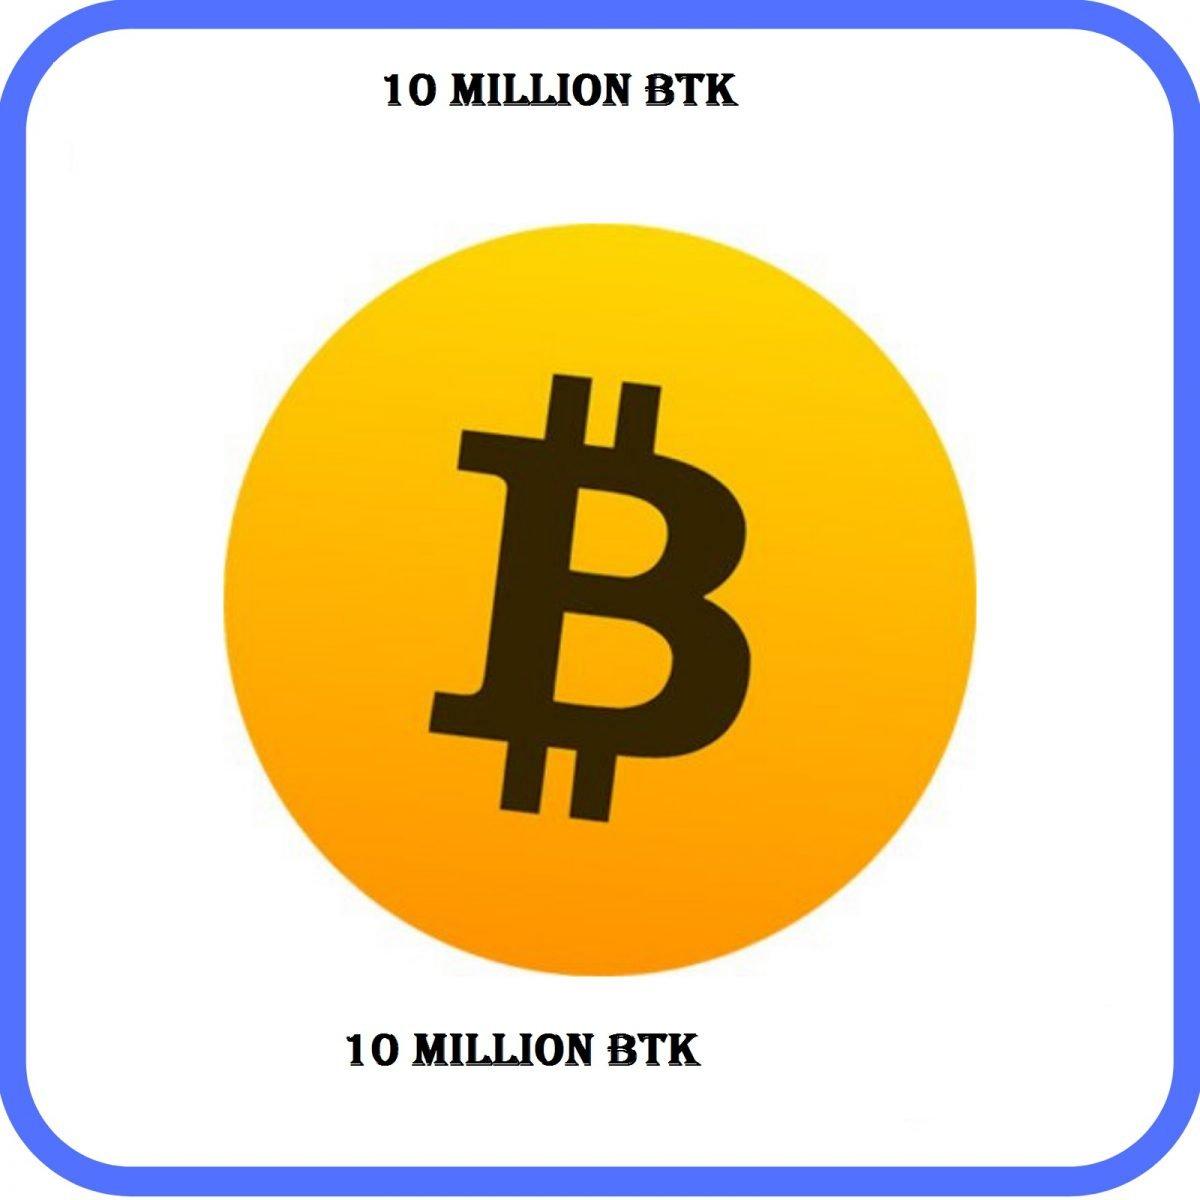 Rent L3 Device Mining Bitcoin-Turbo-Koin Get 10 Million BTK